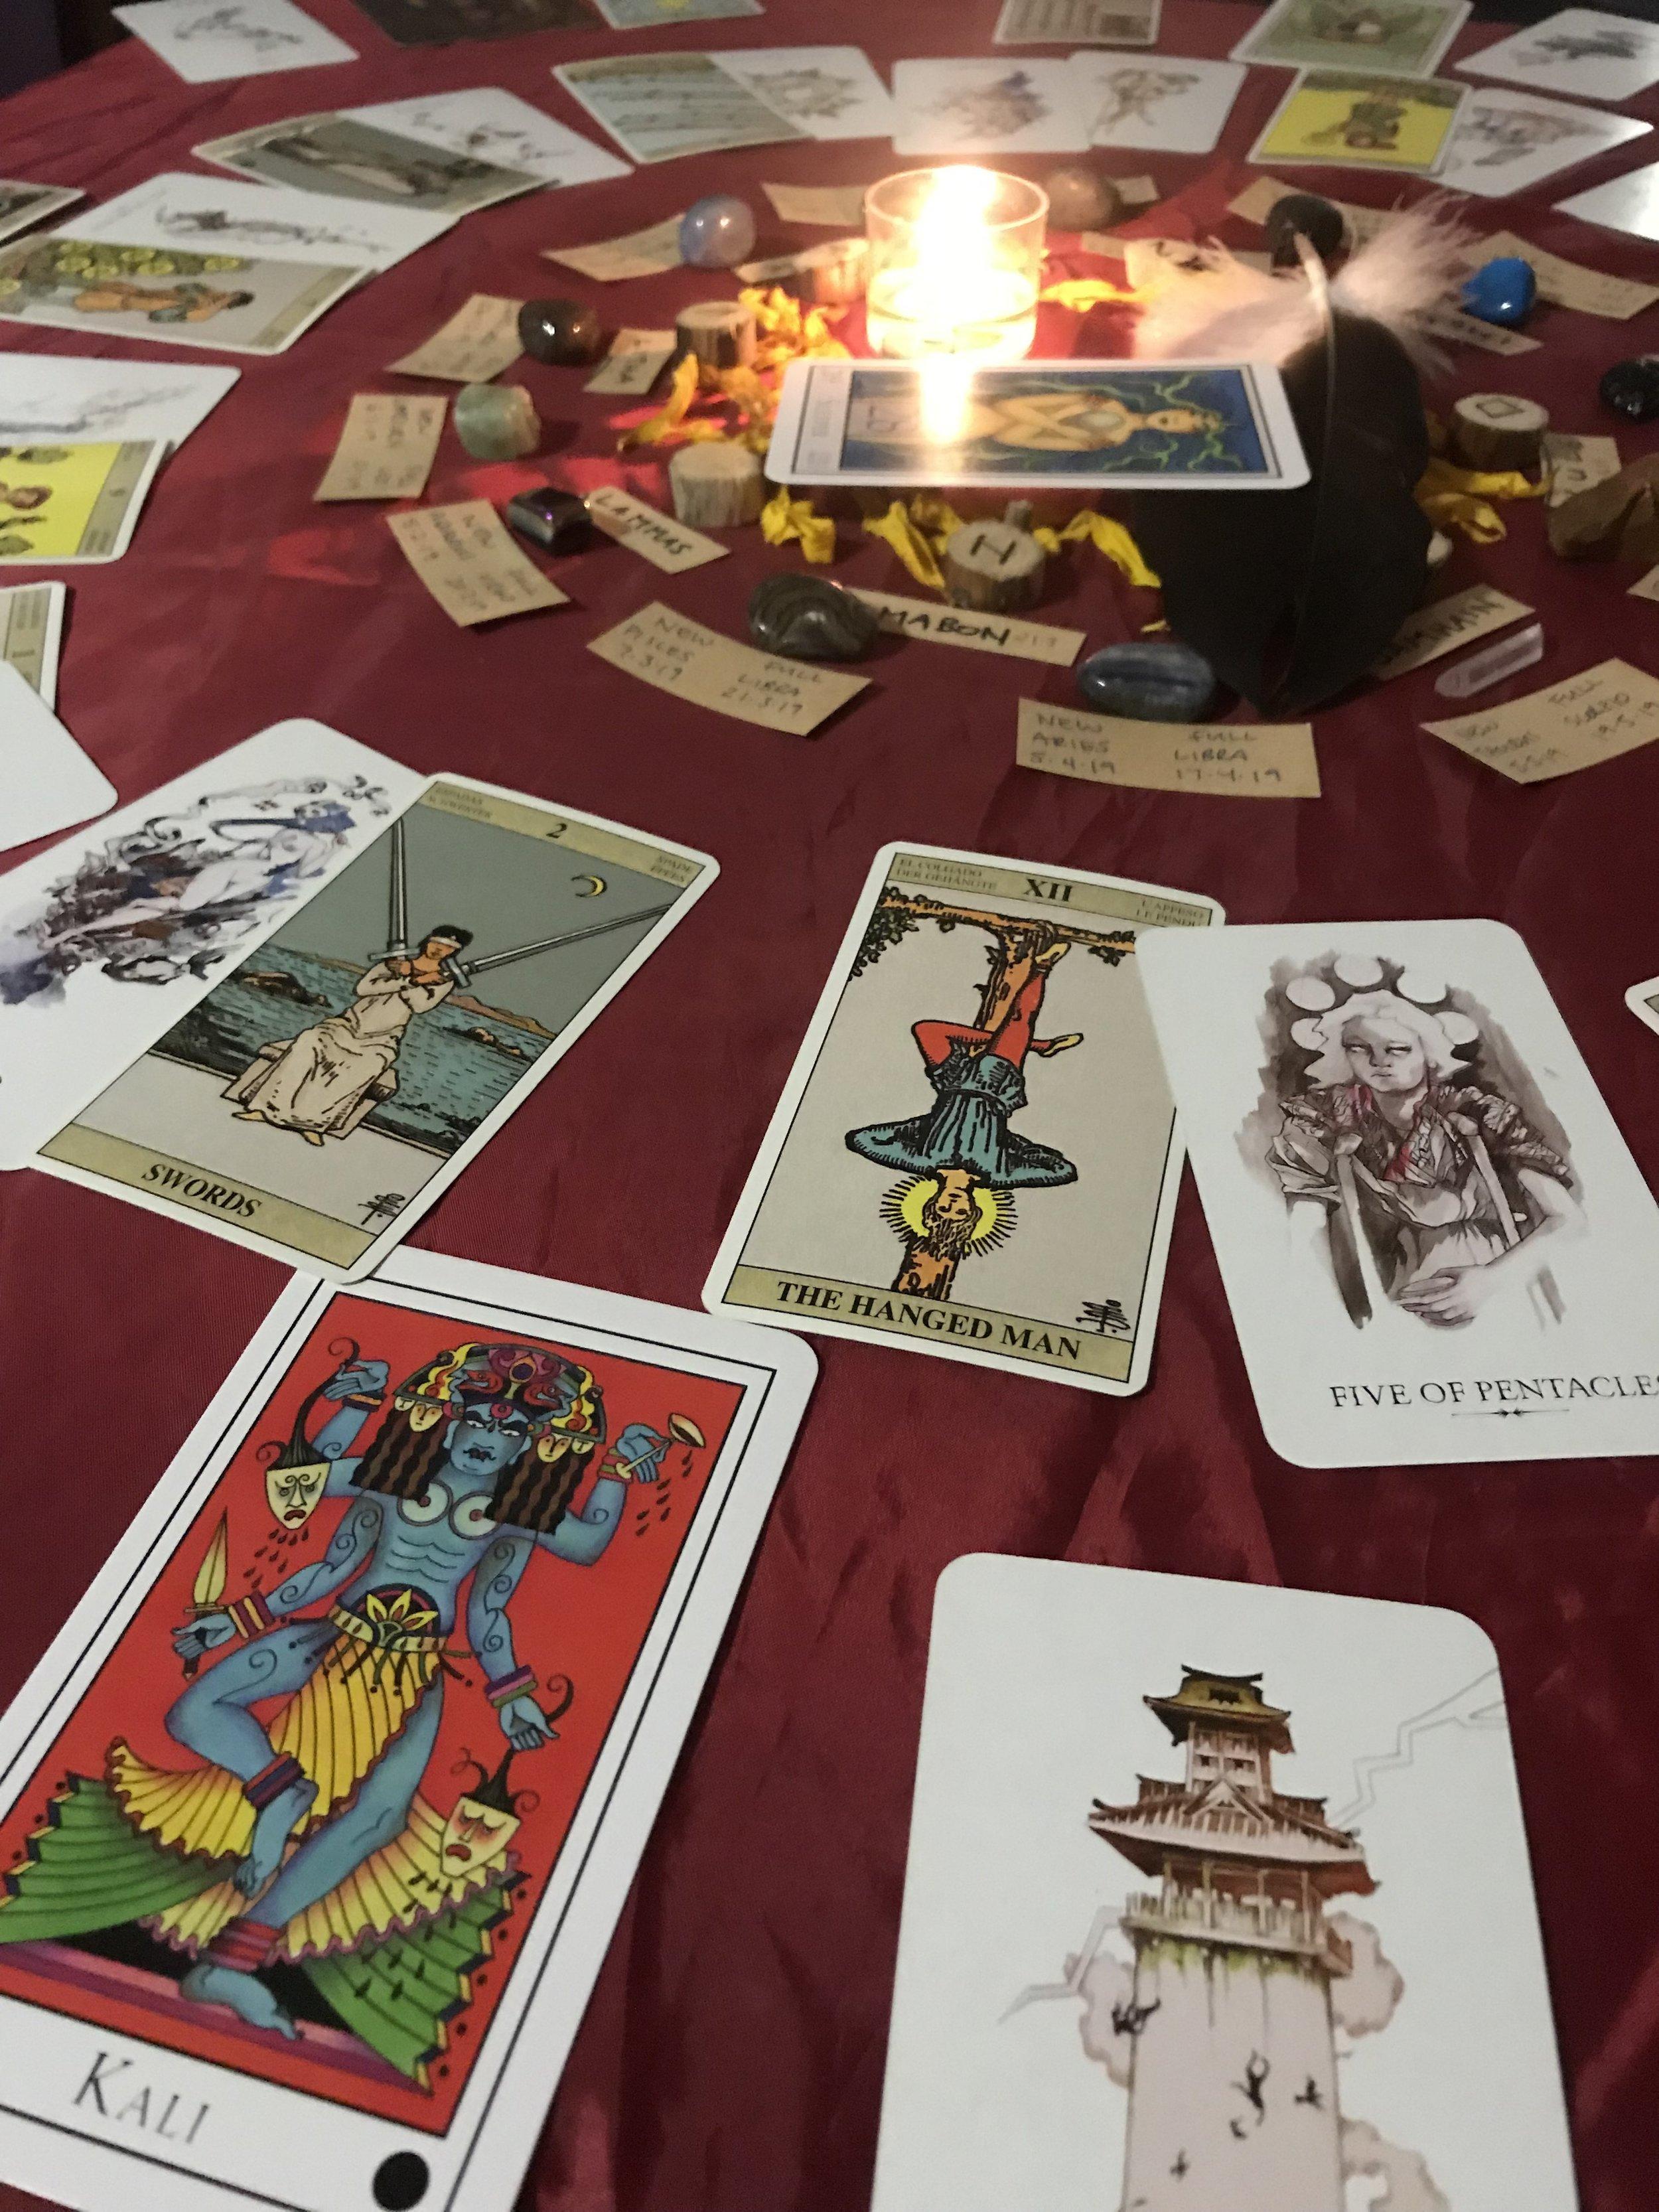 tarot reading spread 13 moons ritual kali magic